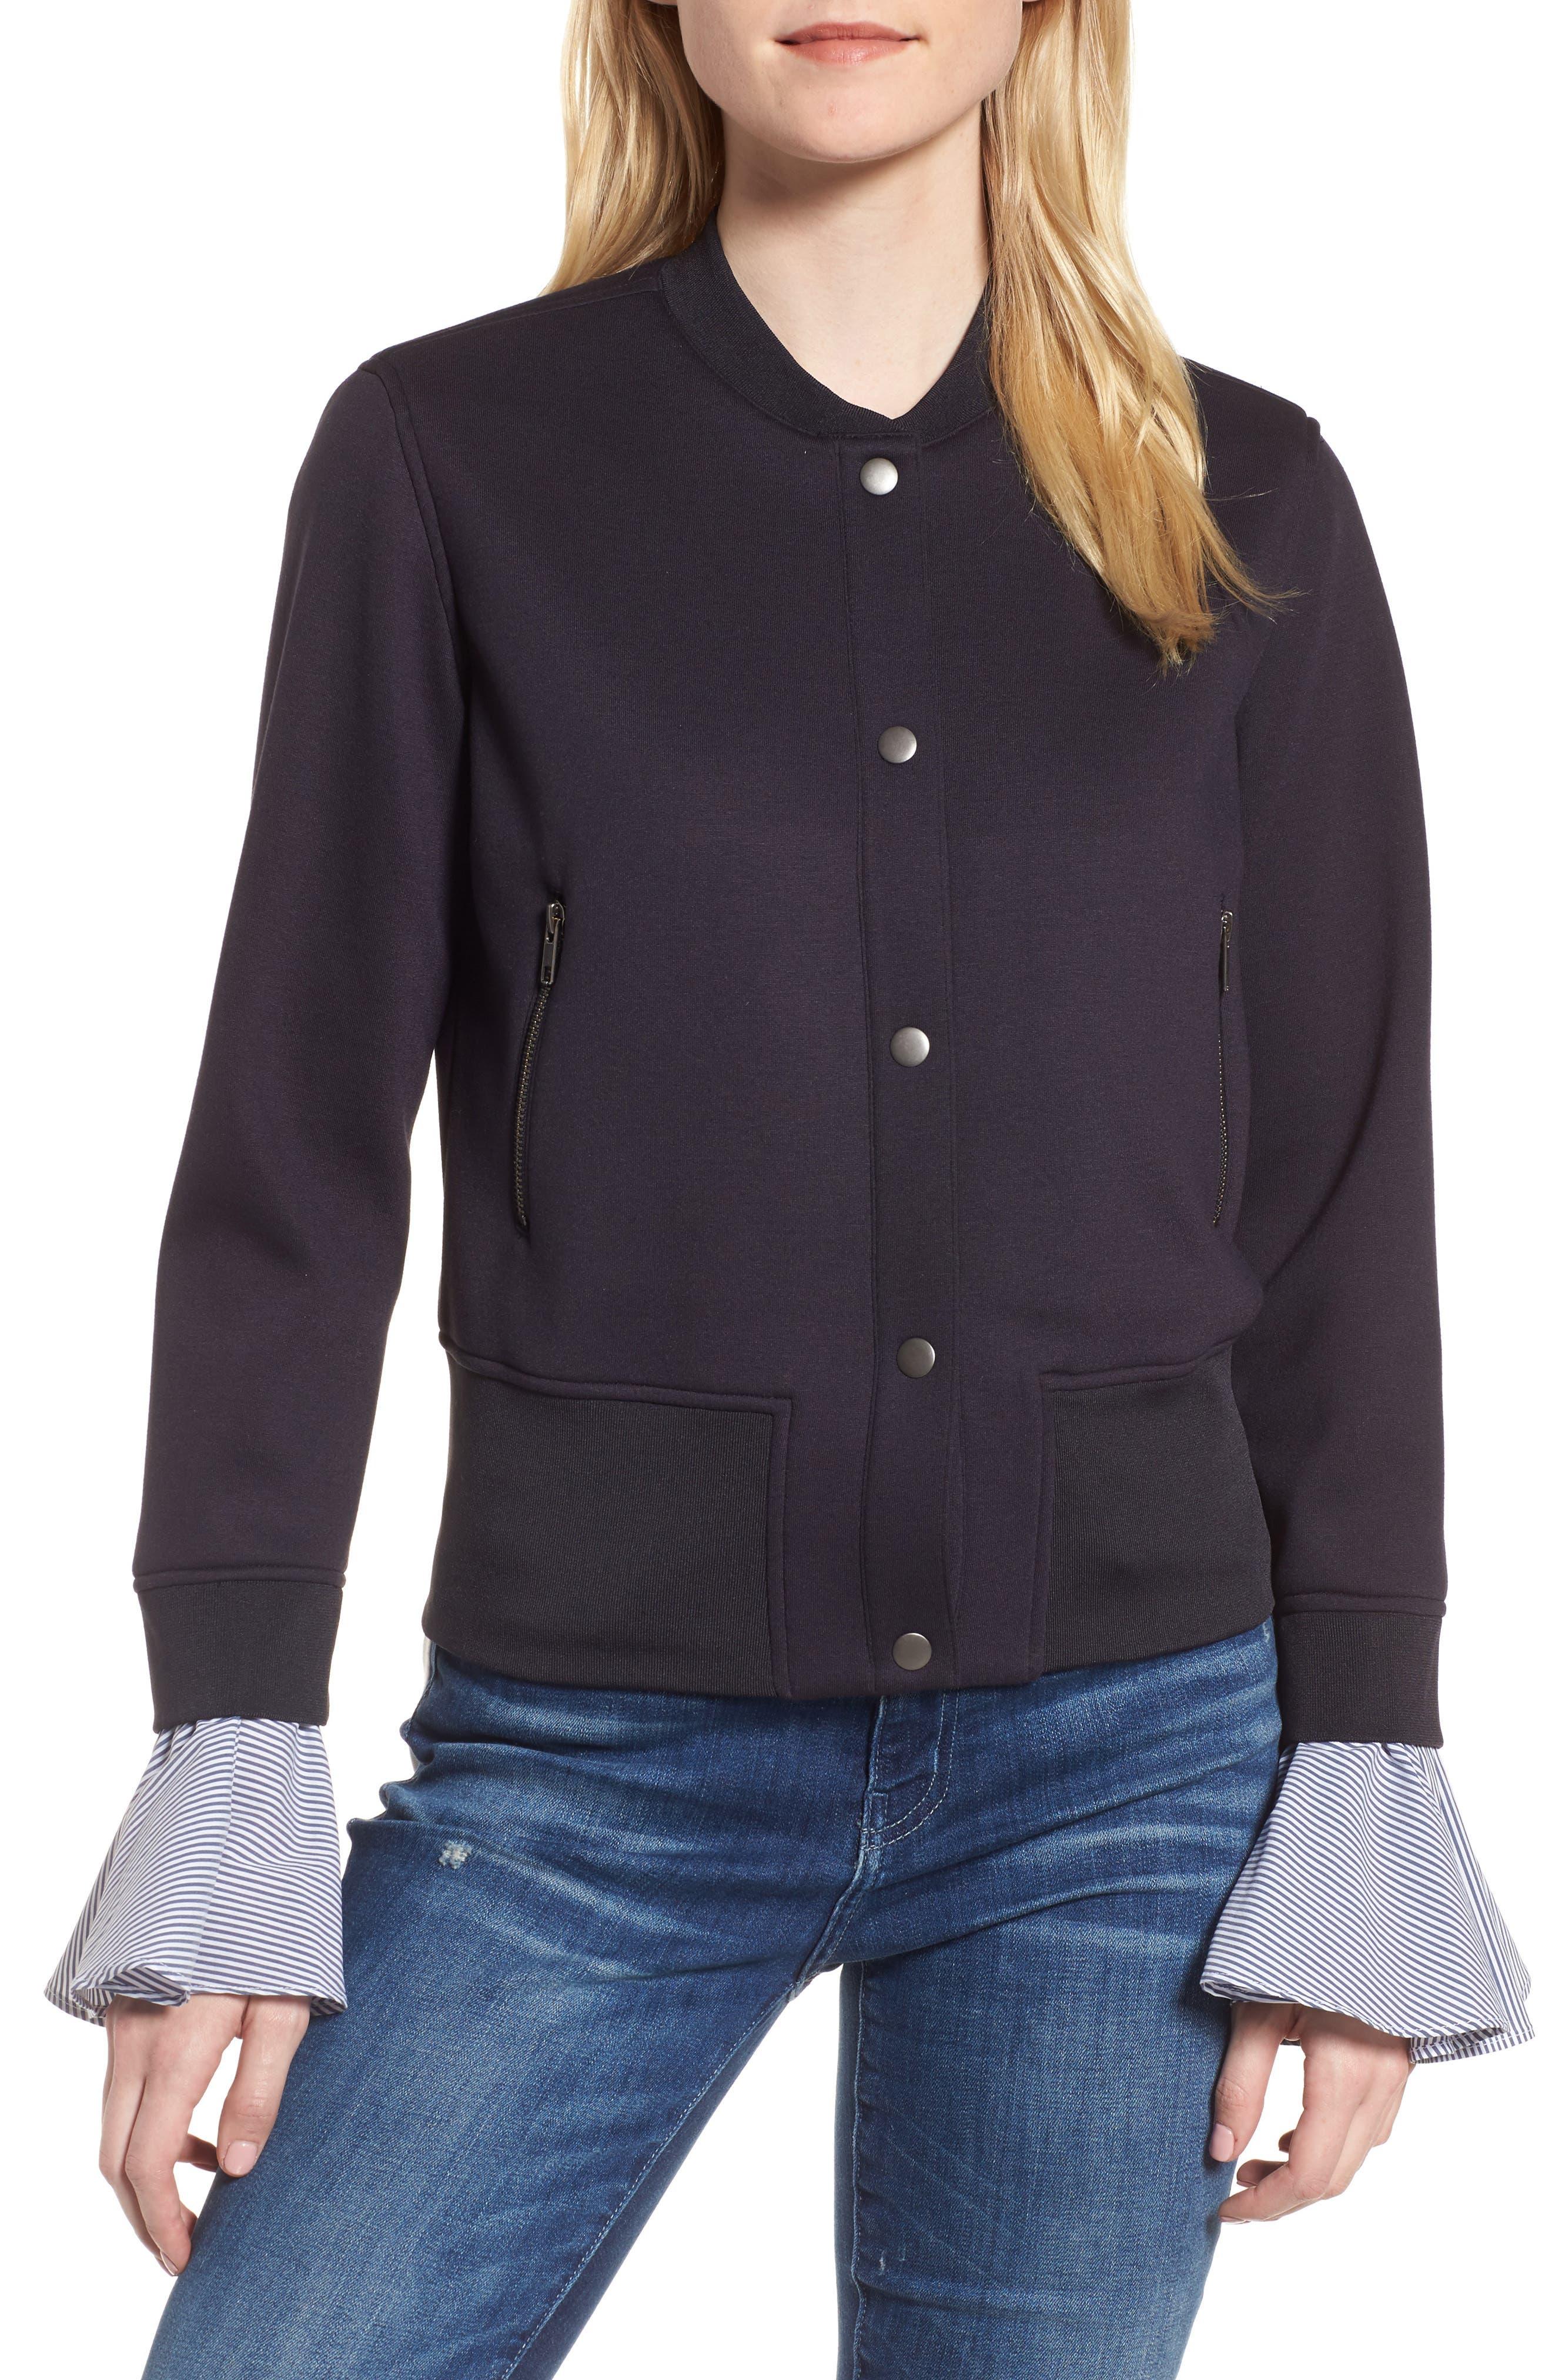 Alternate Image 1 Selected - Chelsea28 Ruffle Sleeve Jacket